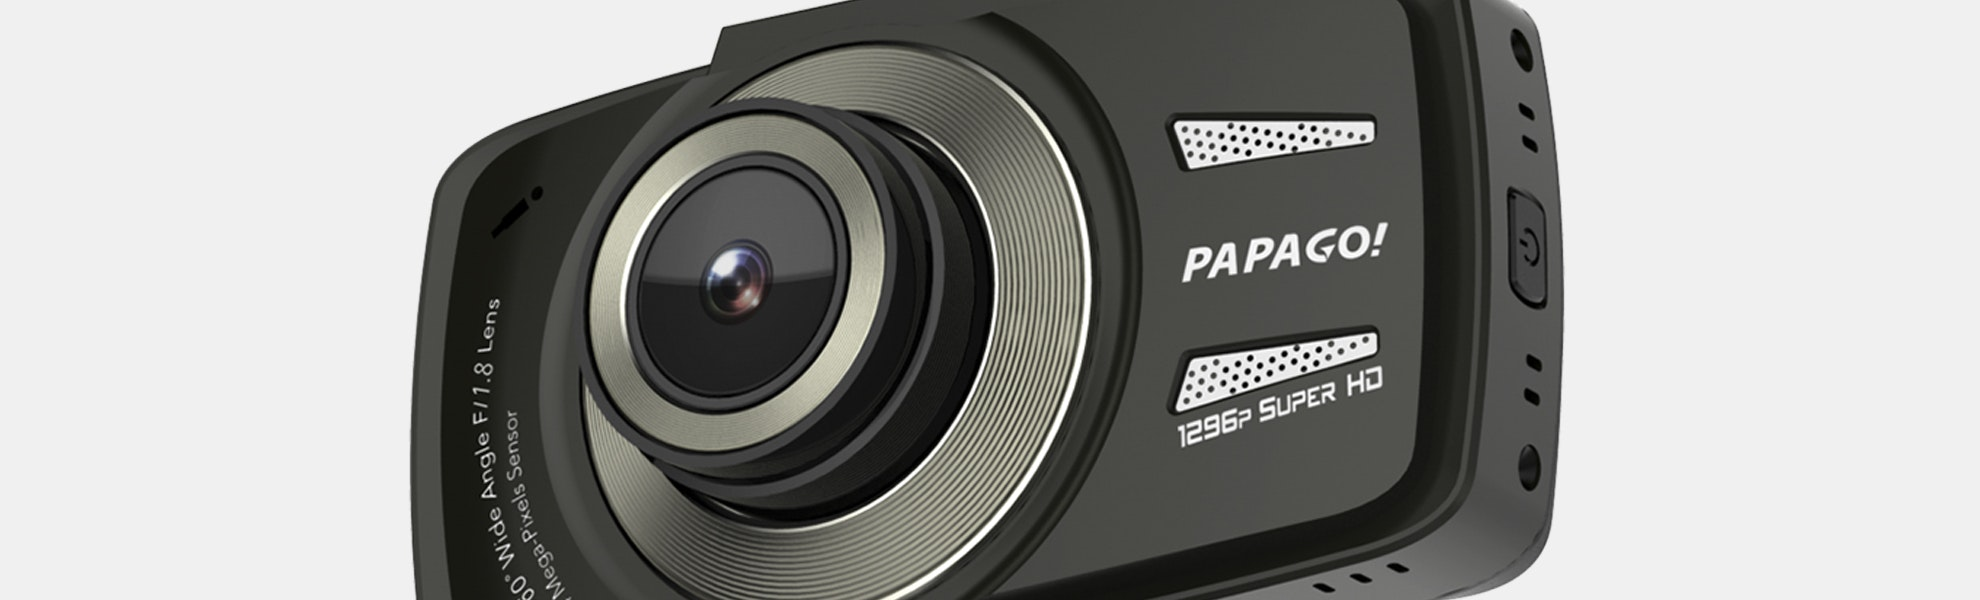 Papago GoSafe 550 Dash Camera with 8GB Micro SD